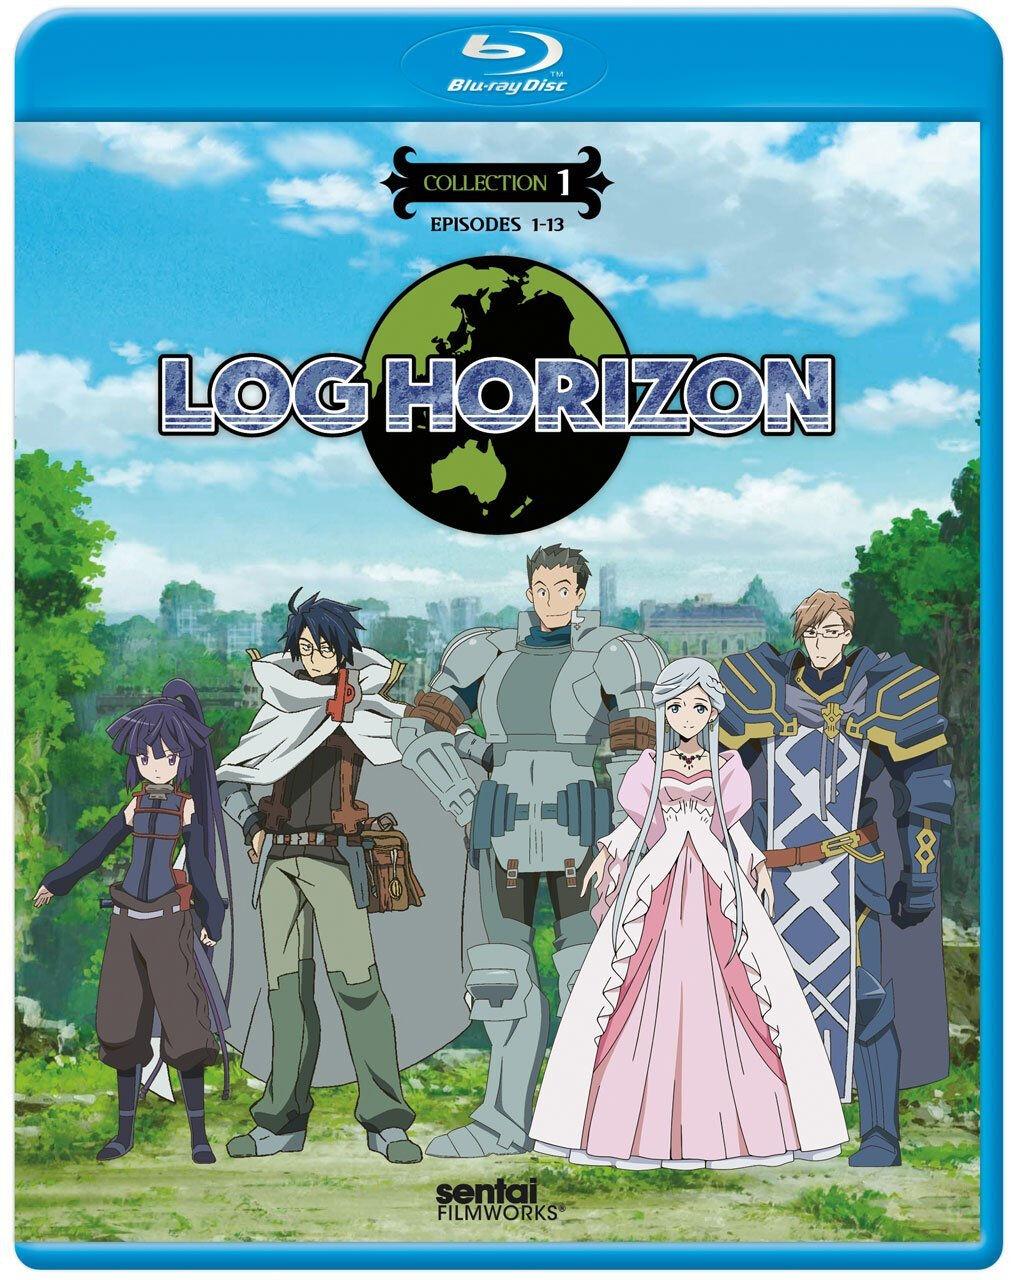 Log Horizon - Collection 1